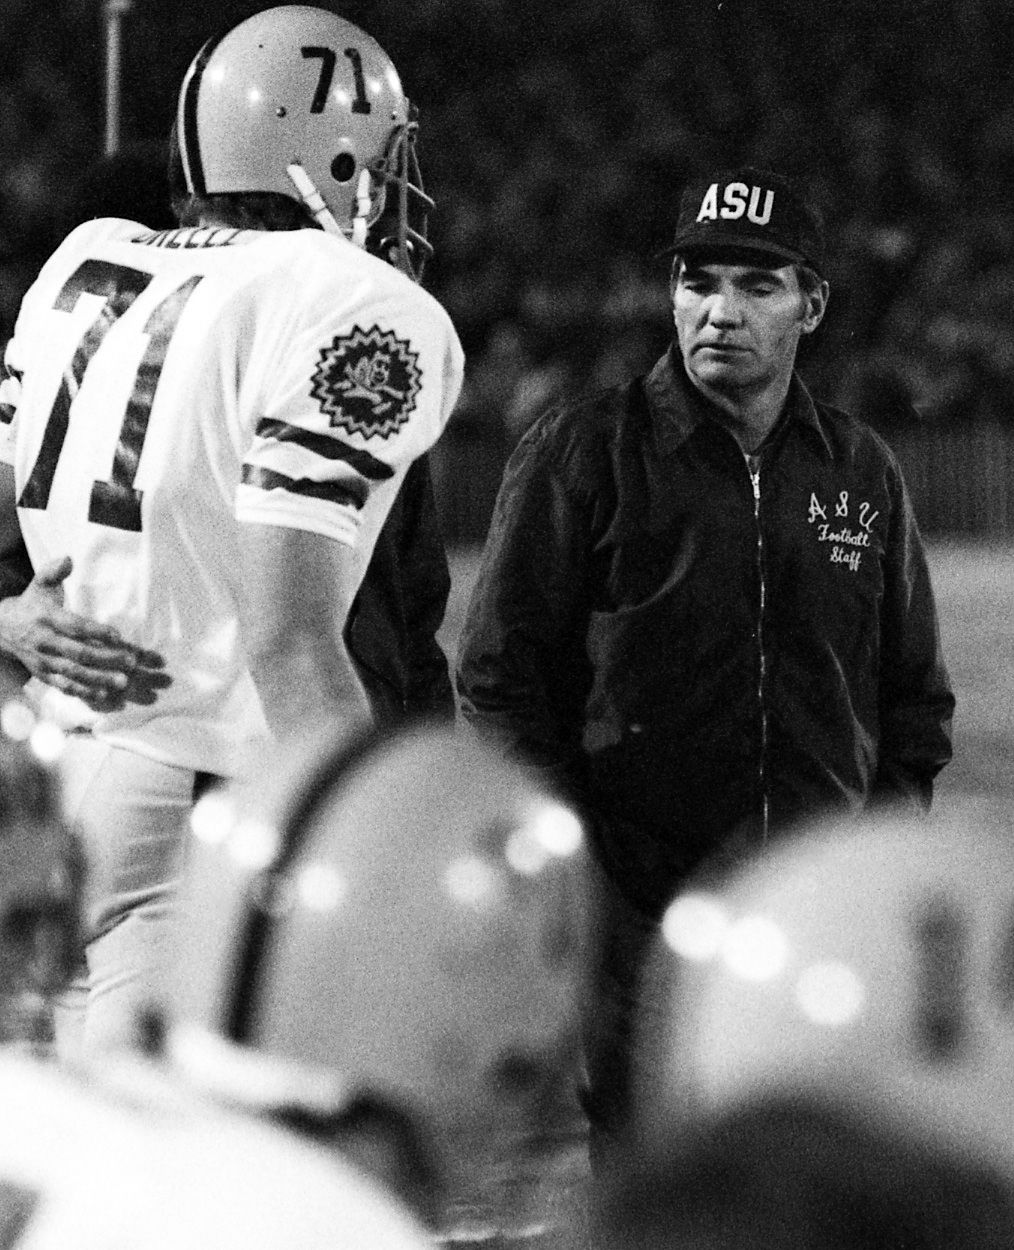 Former ASU coach Frank Kush left his mark in Tucson